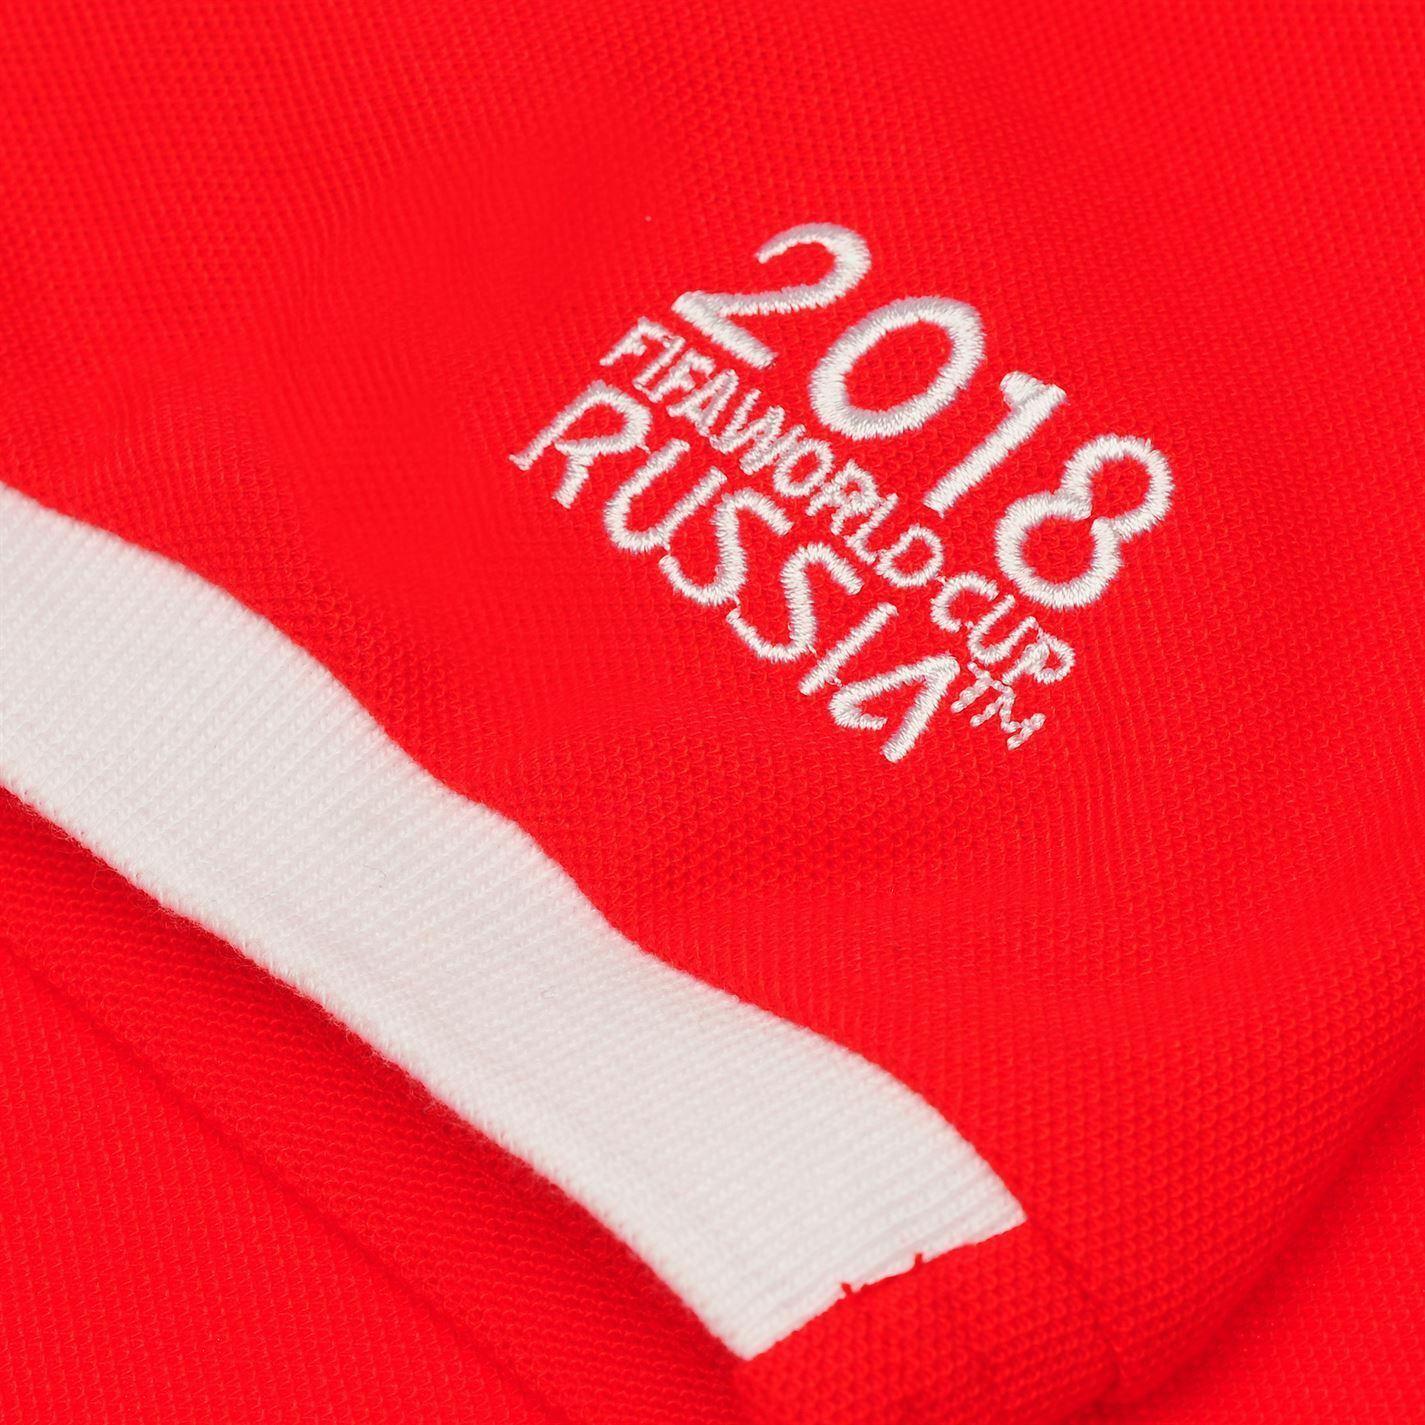 miniature 6 - FIFA Coupe du monde 2018 Angleterre Polo Shirt Homme Football Soccer Top T-Shirt Tee